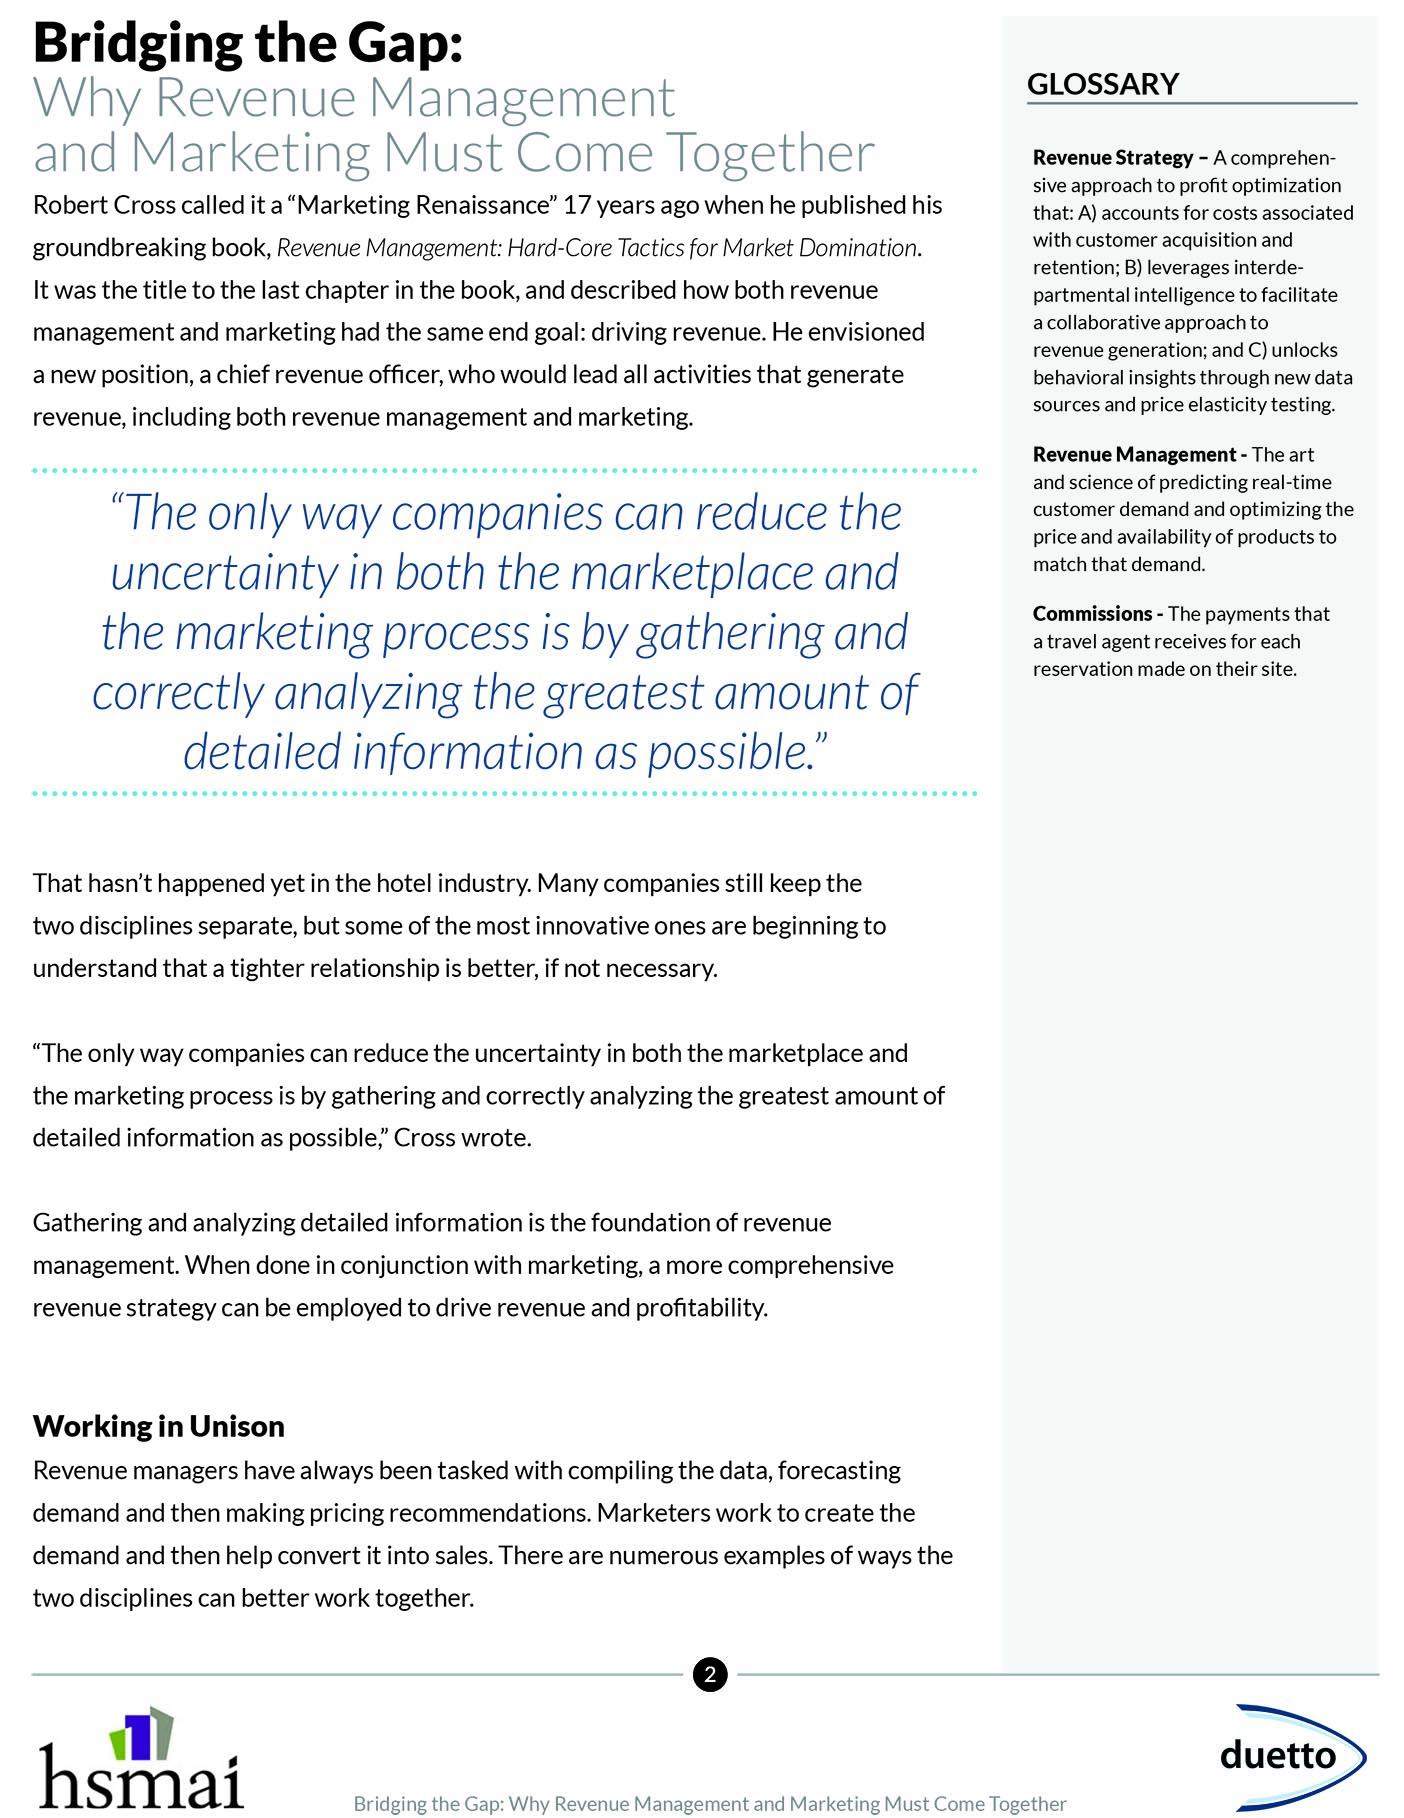 2 HSMAI - Bridging-the-Gap-Revenue-Management-Marketing-2.jpg